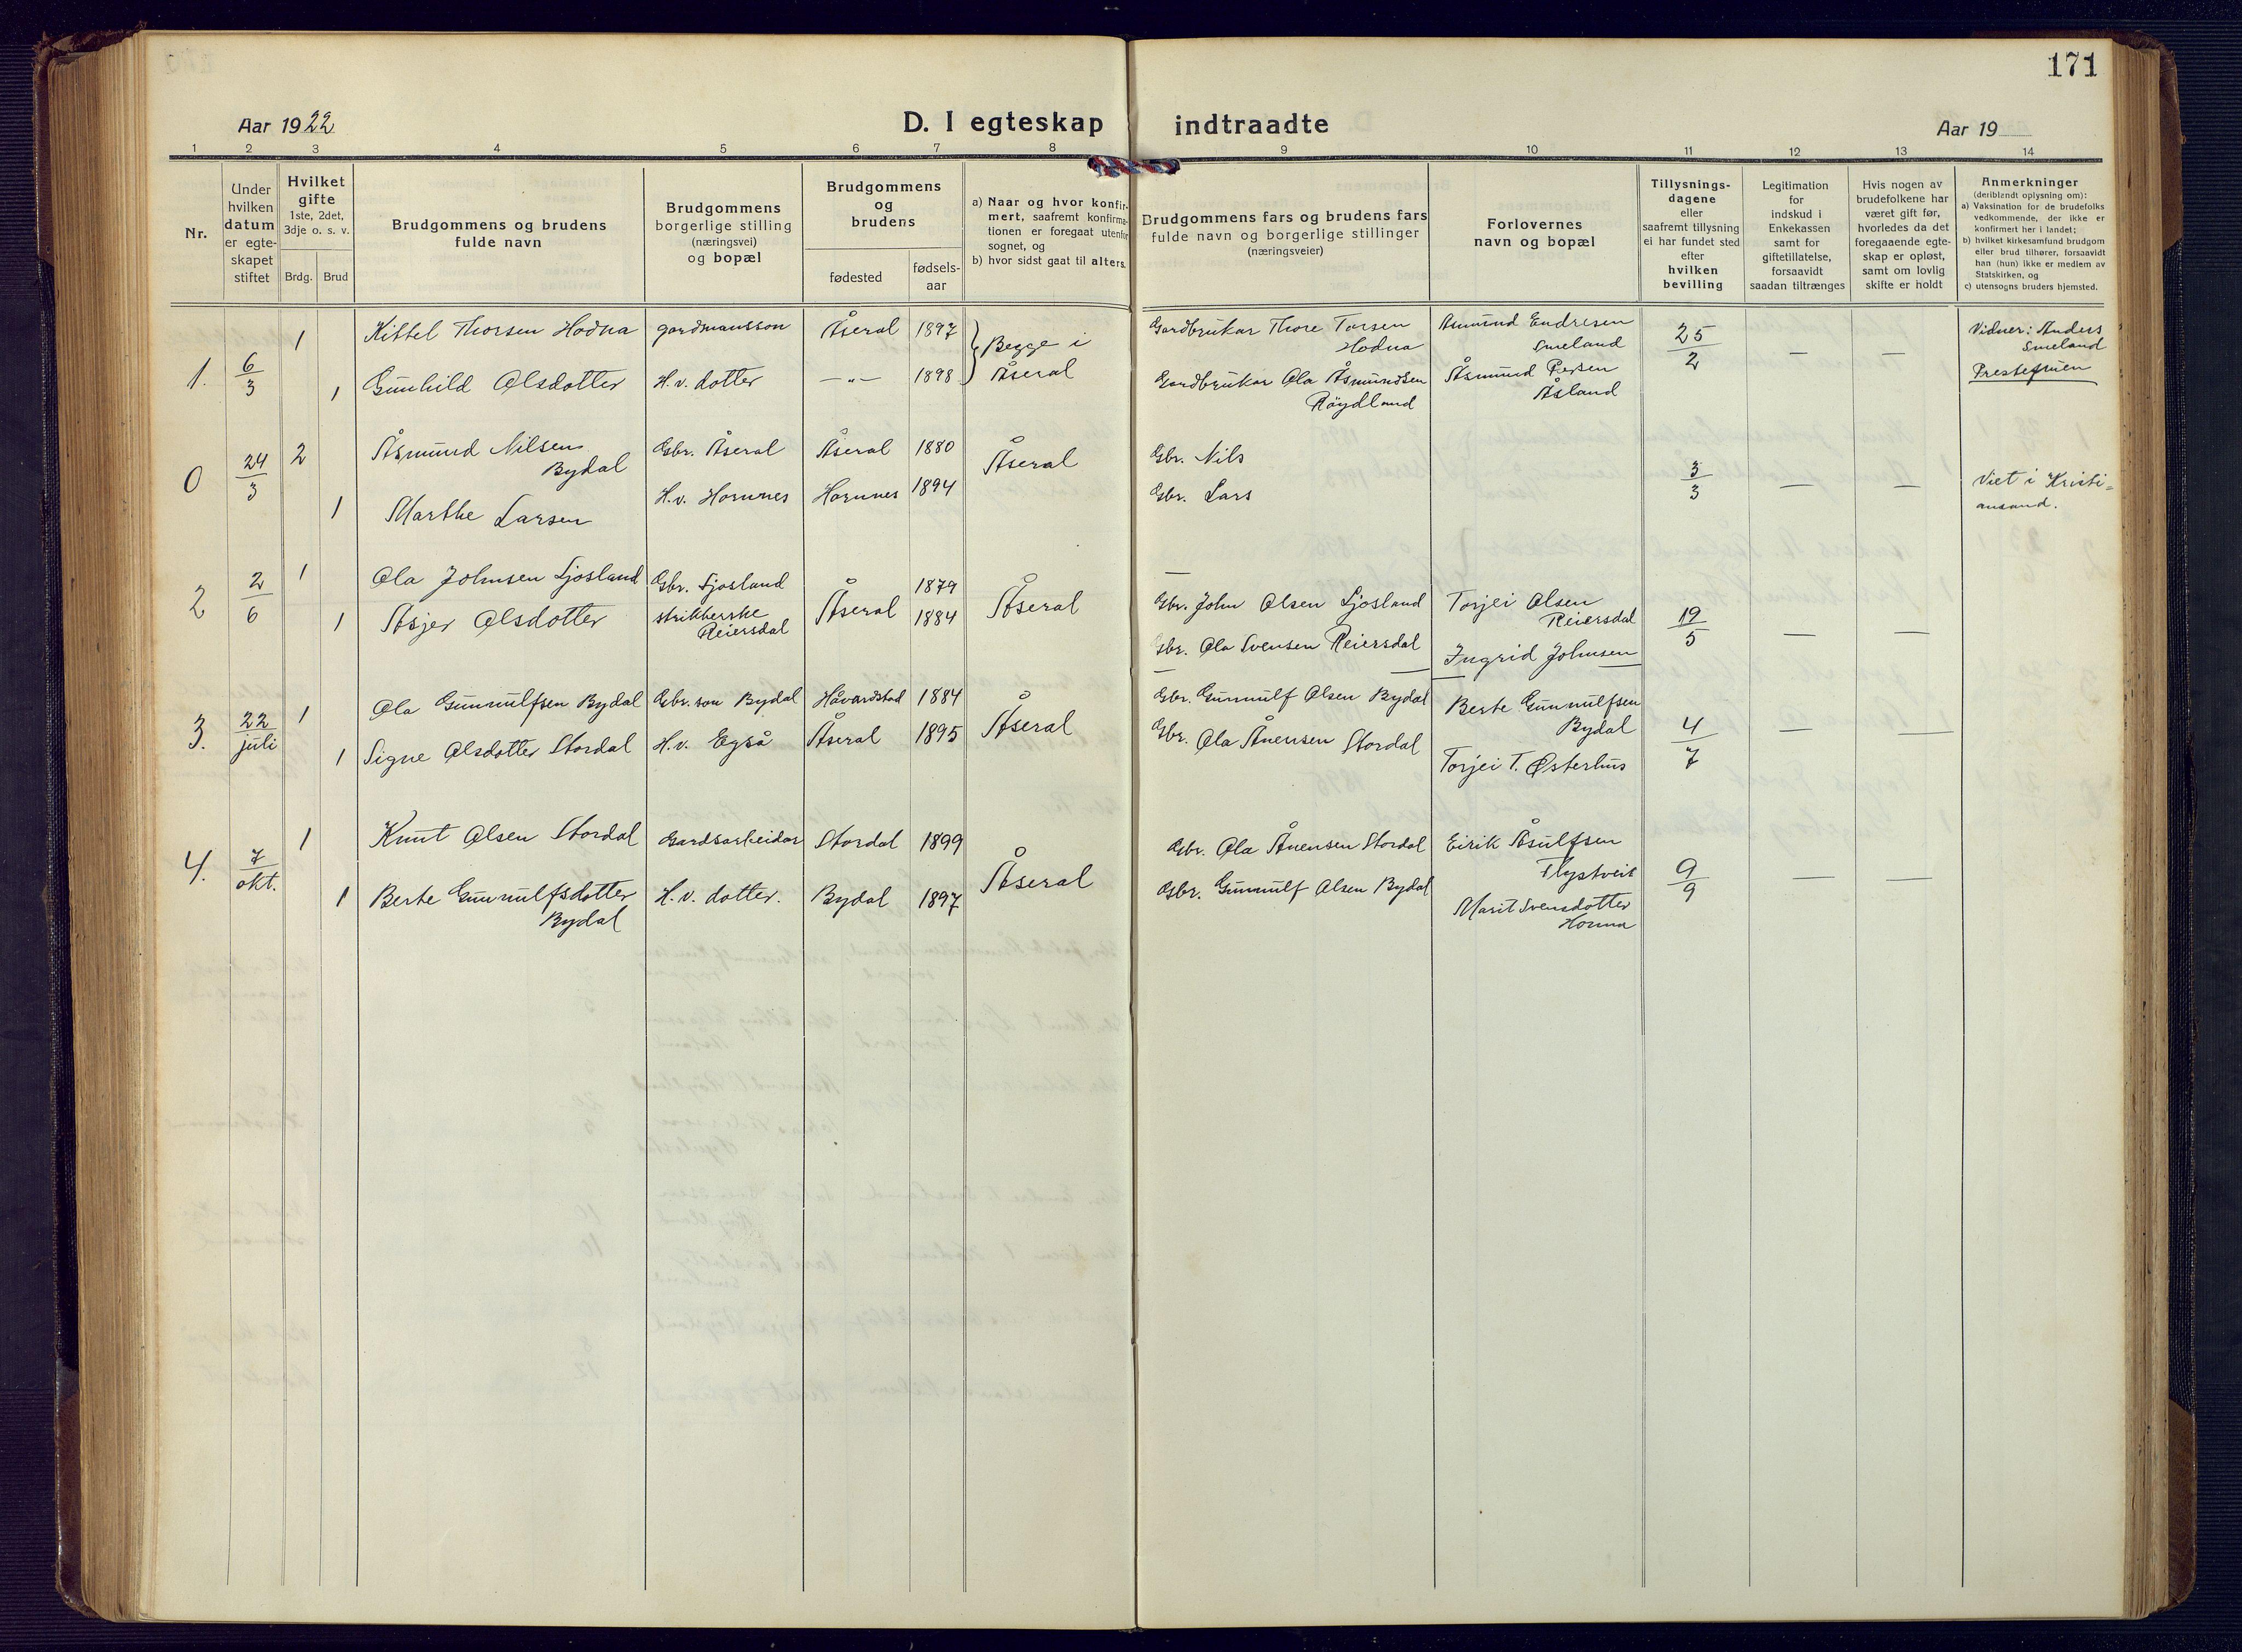 SAK, Åseral sokneprestkontor, F/Fb/L0004: Klokkerbok nr. B 4, 1920-1946, s. 171